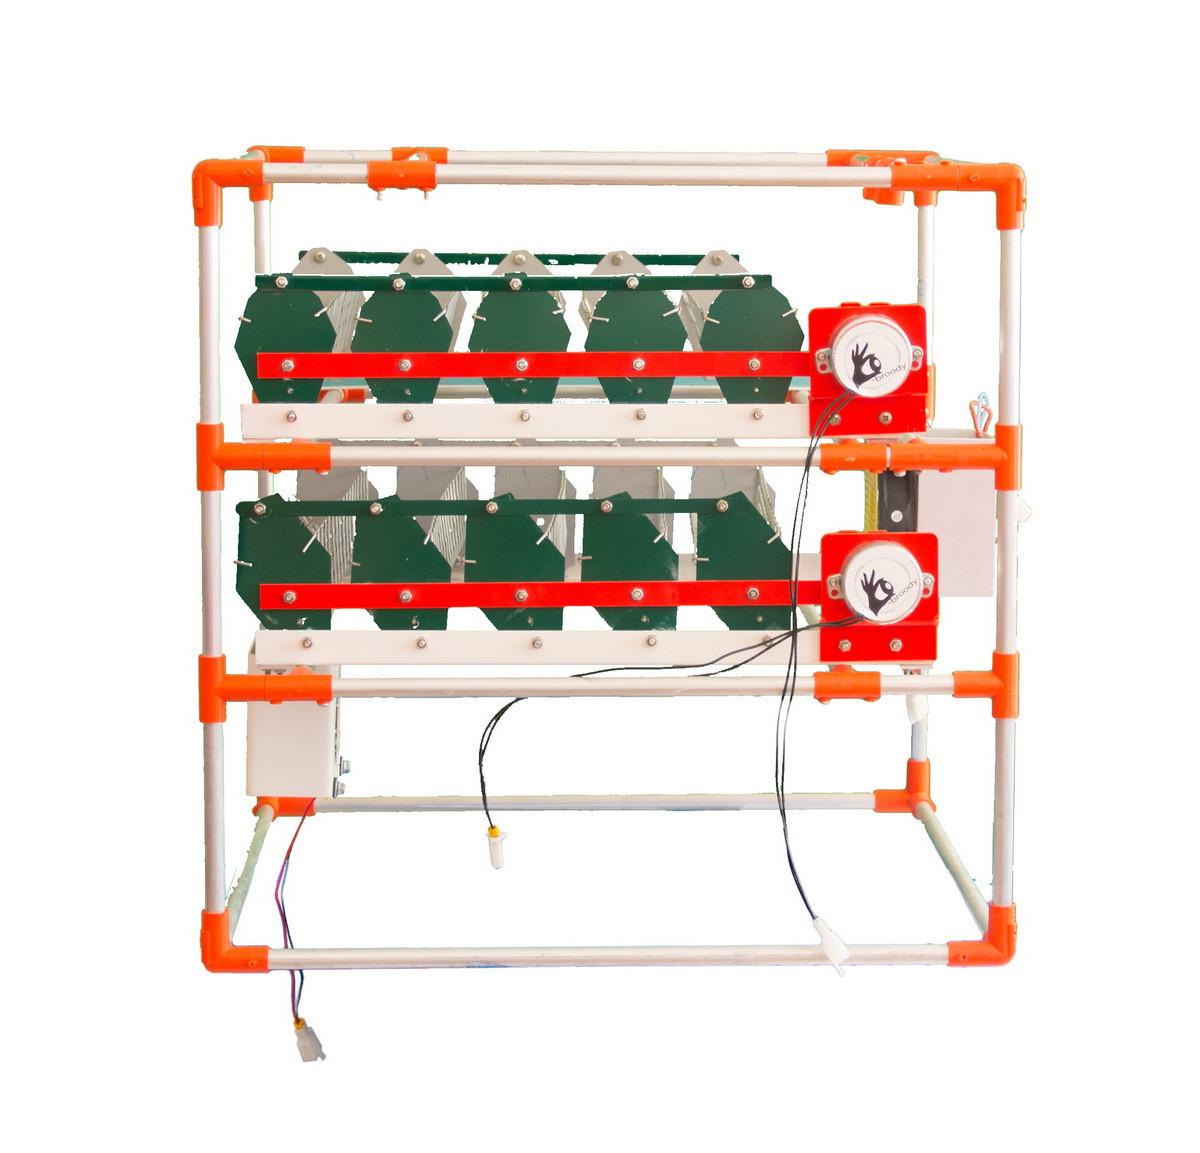 Автоматический инкубатор-конструктор (220V) на 90 яиц, с увлажнителем - фото 3